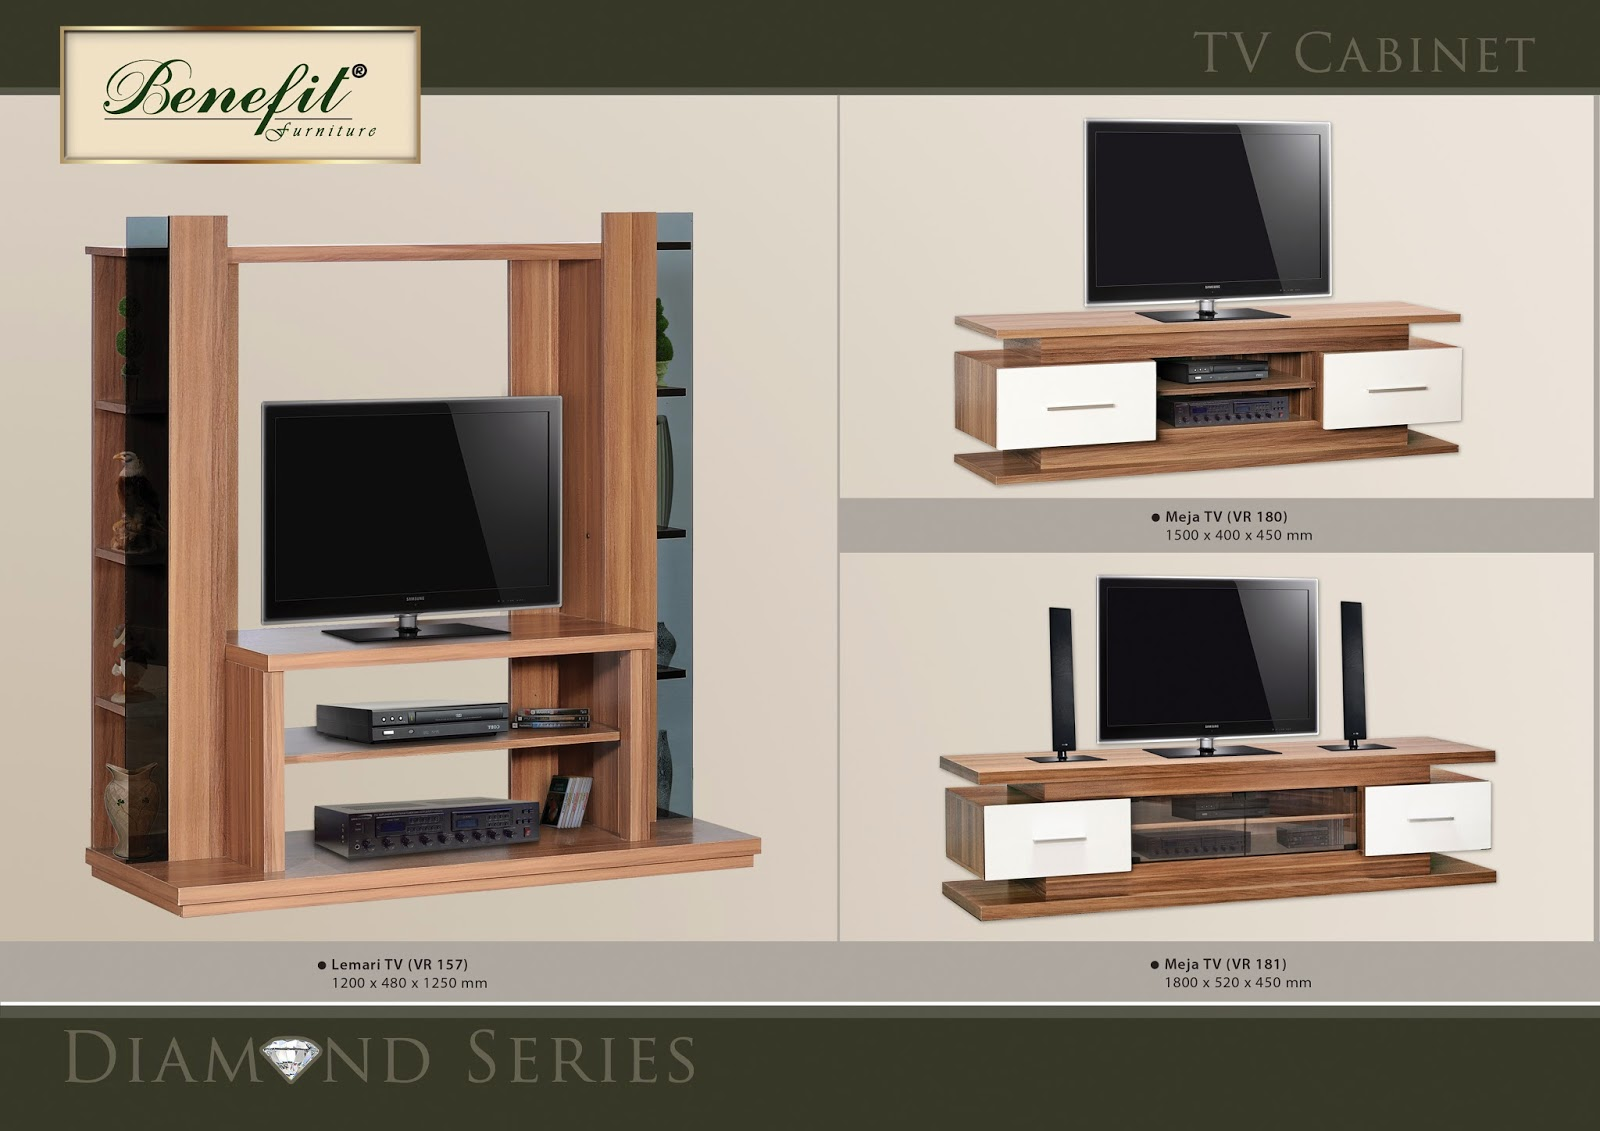 http://www.lemarionline.com/2012/09/tv-cabinet-diamond-series.html